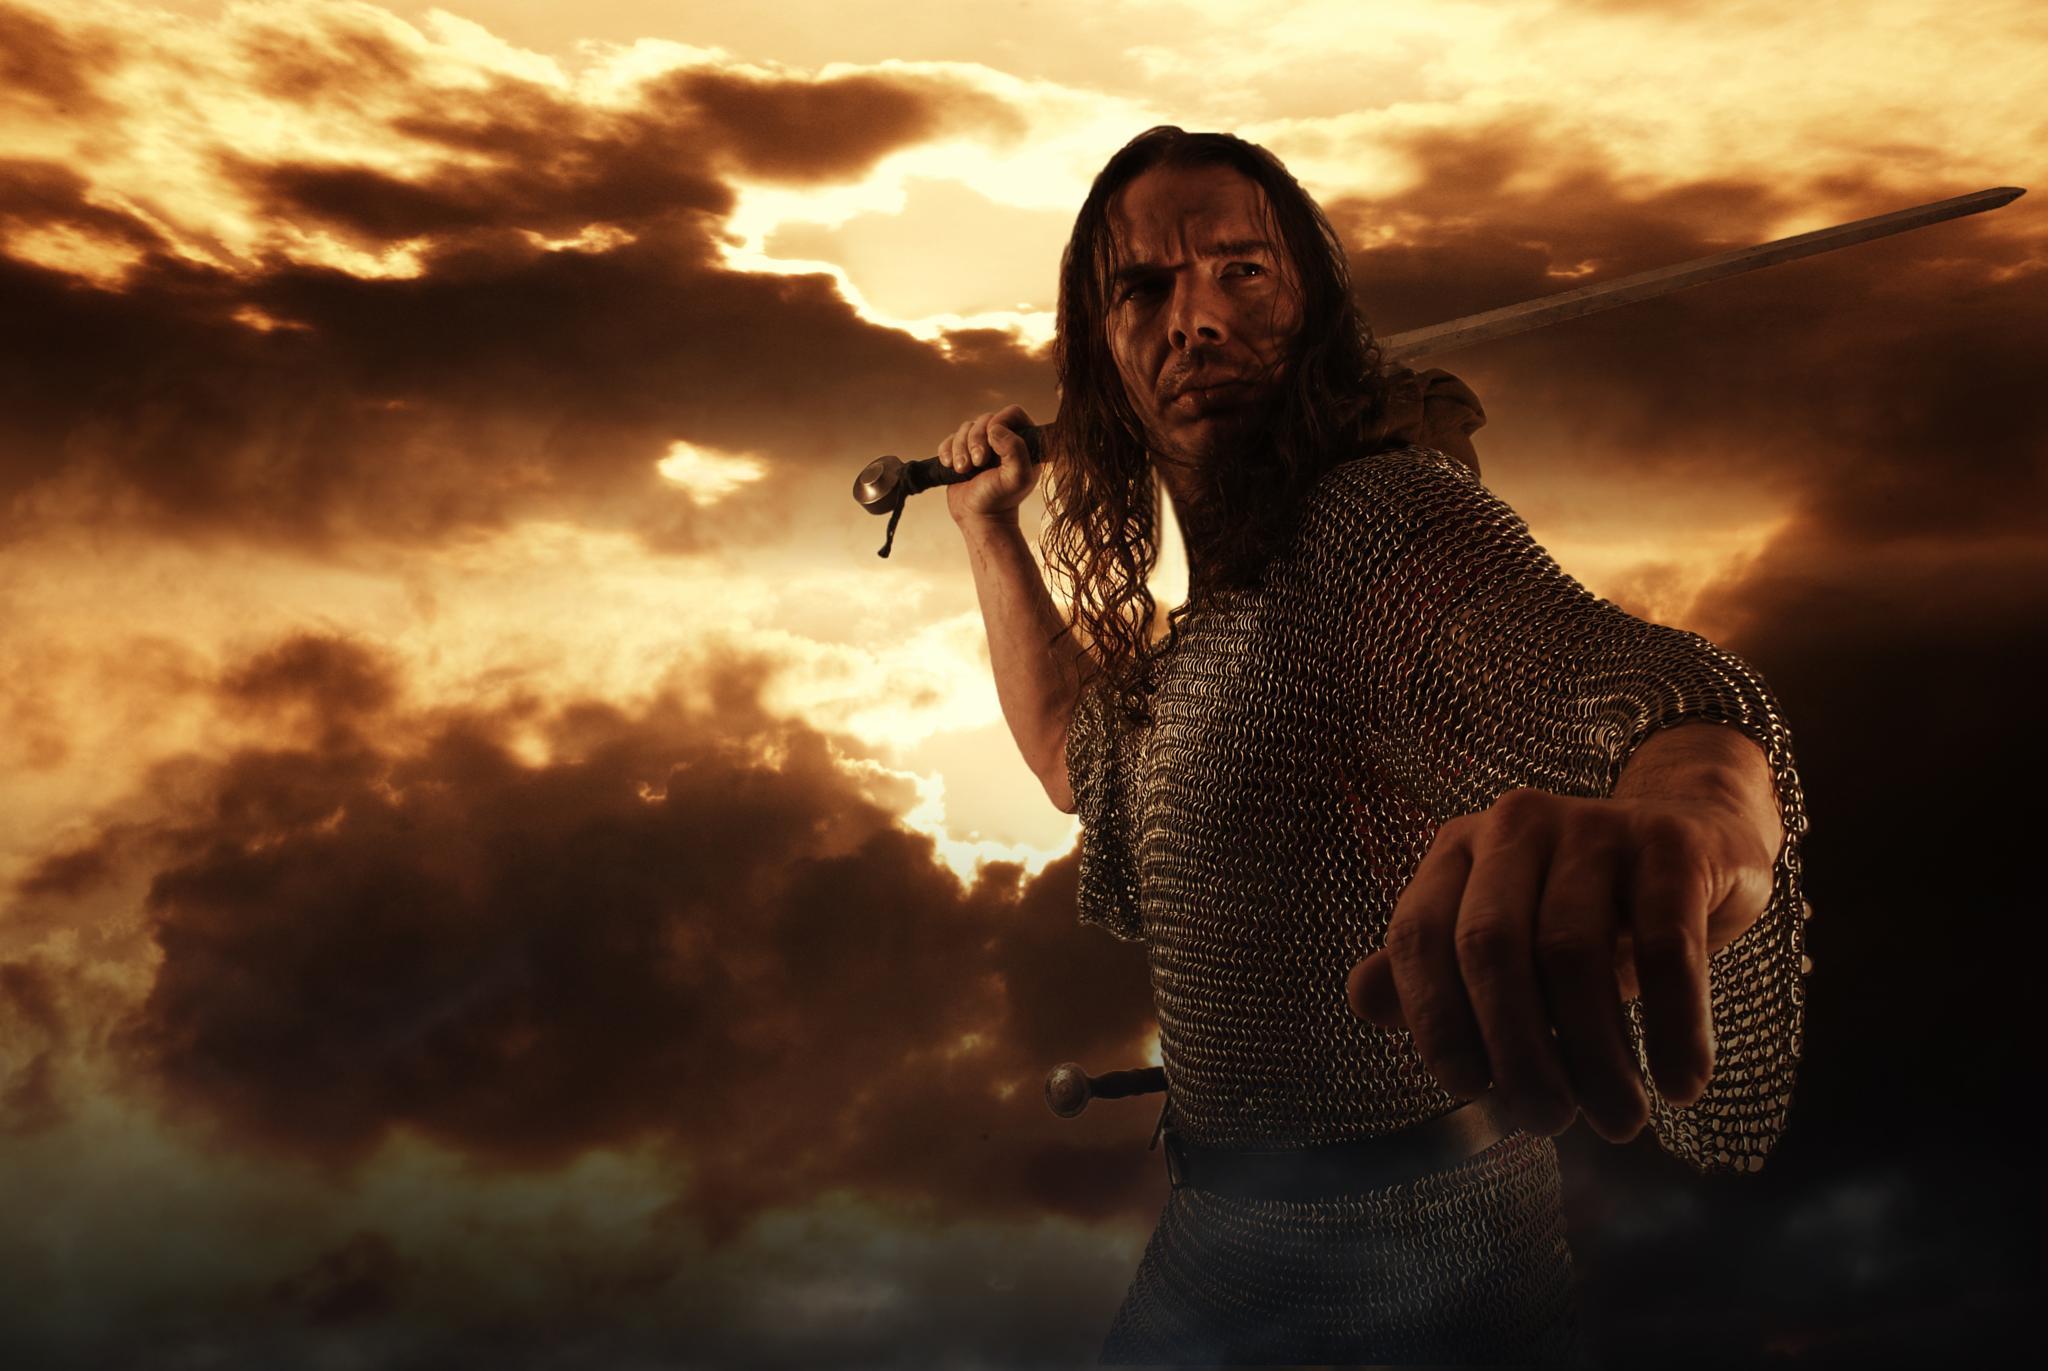 Aragorn, Son of Arathorn by Kristof Z.